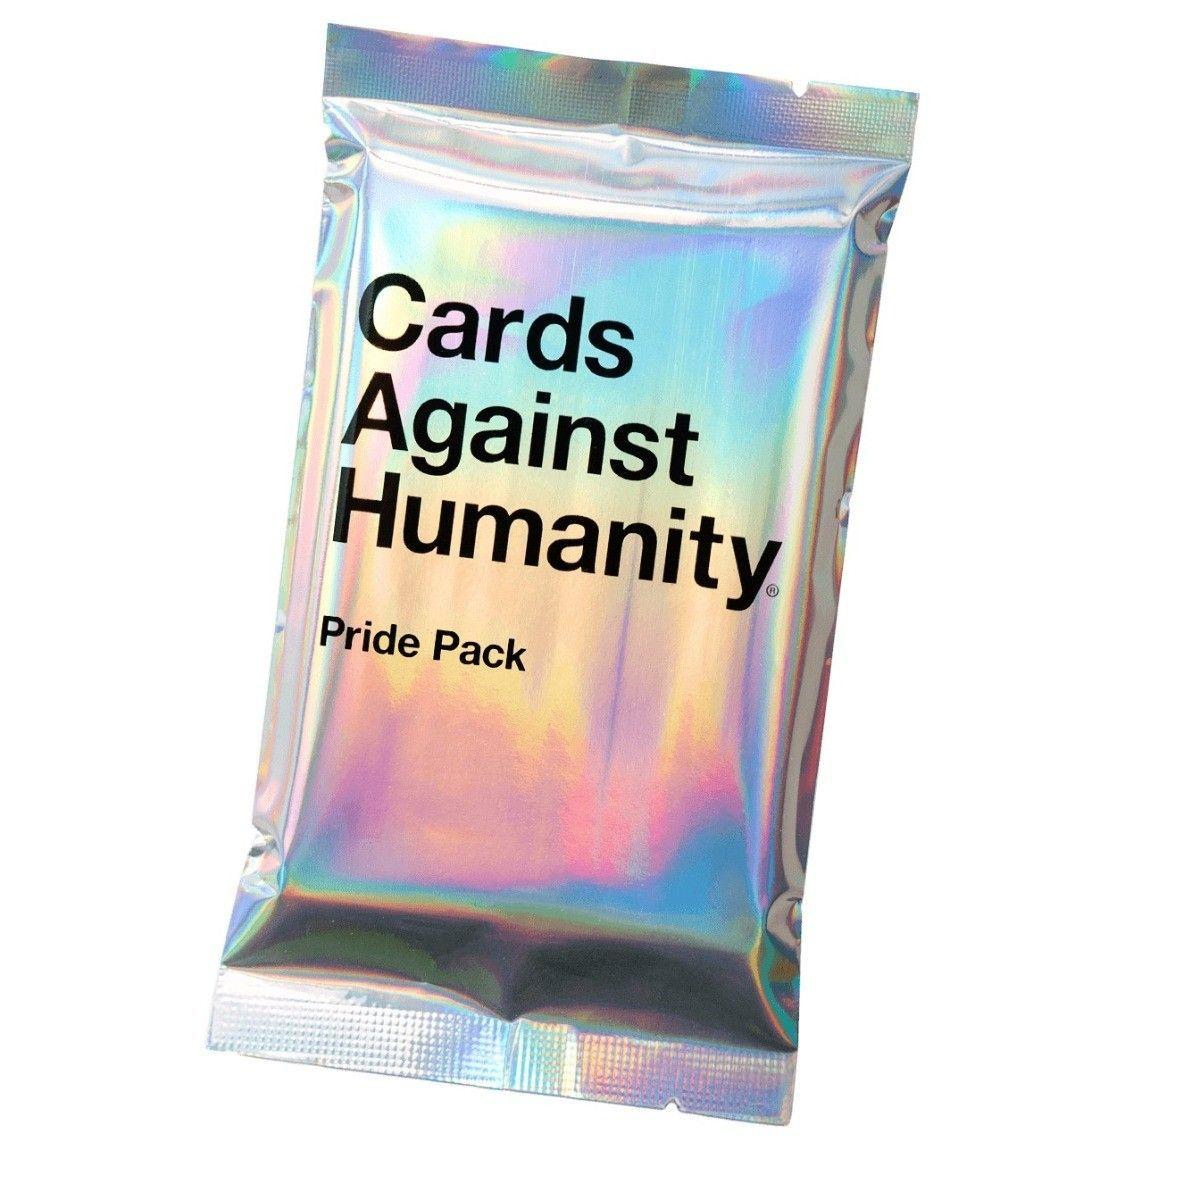 Cards Against Humanity Pride Pack